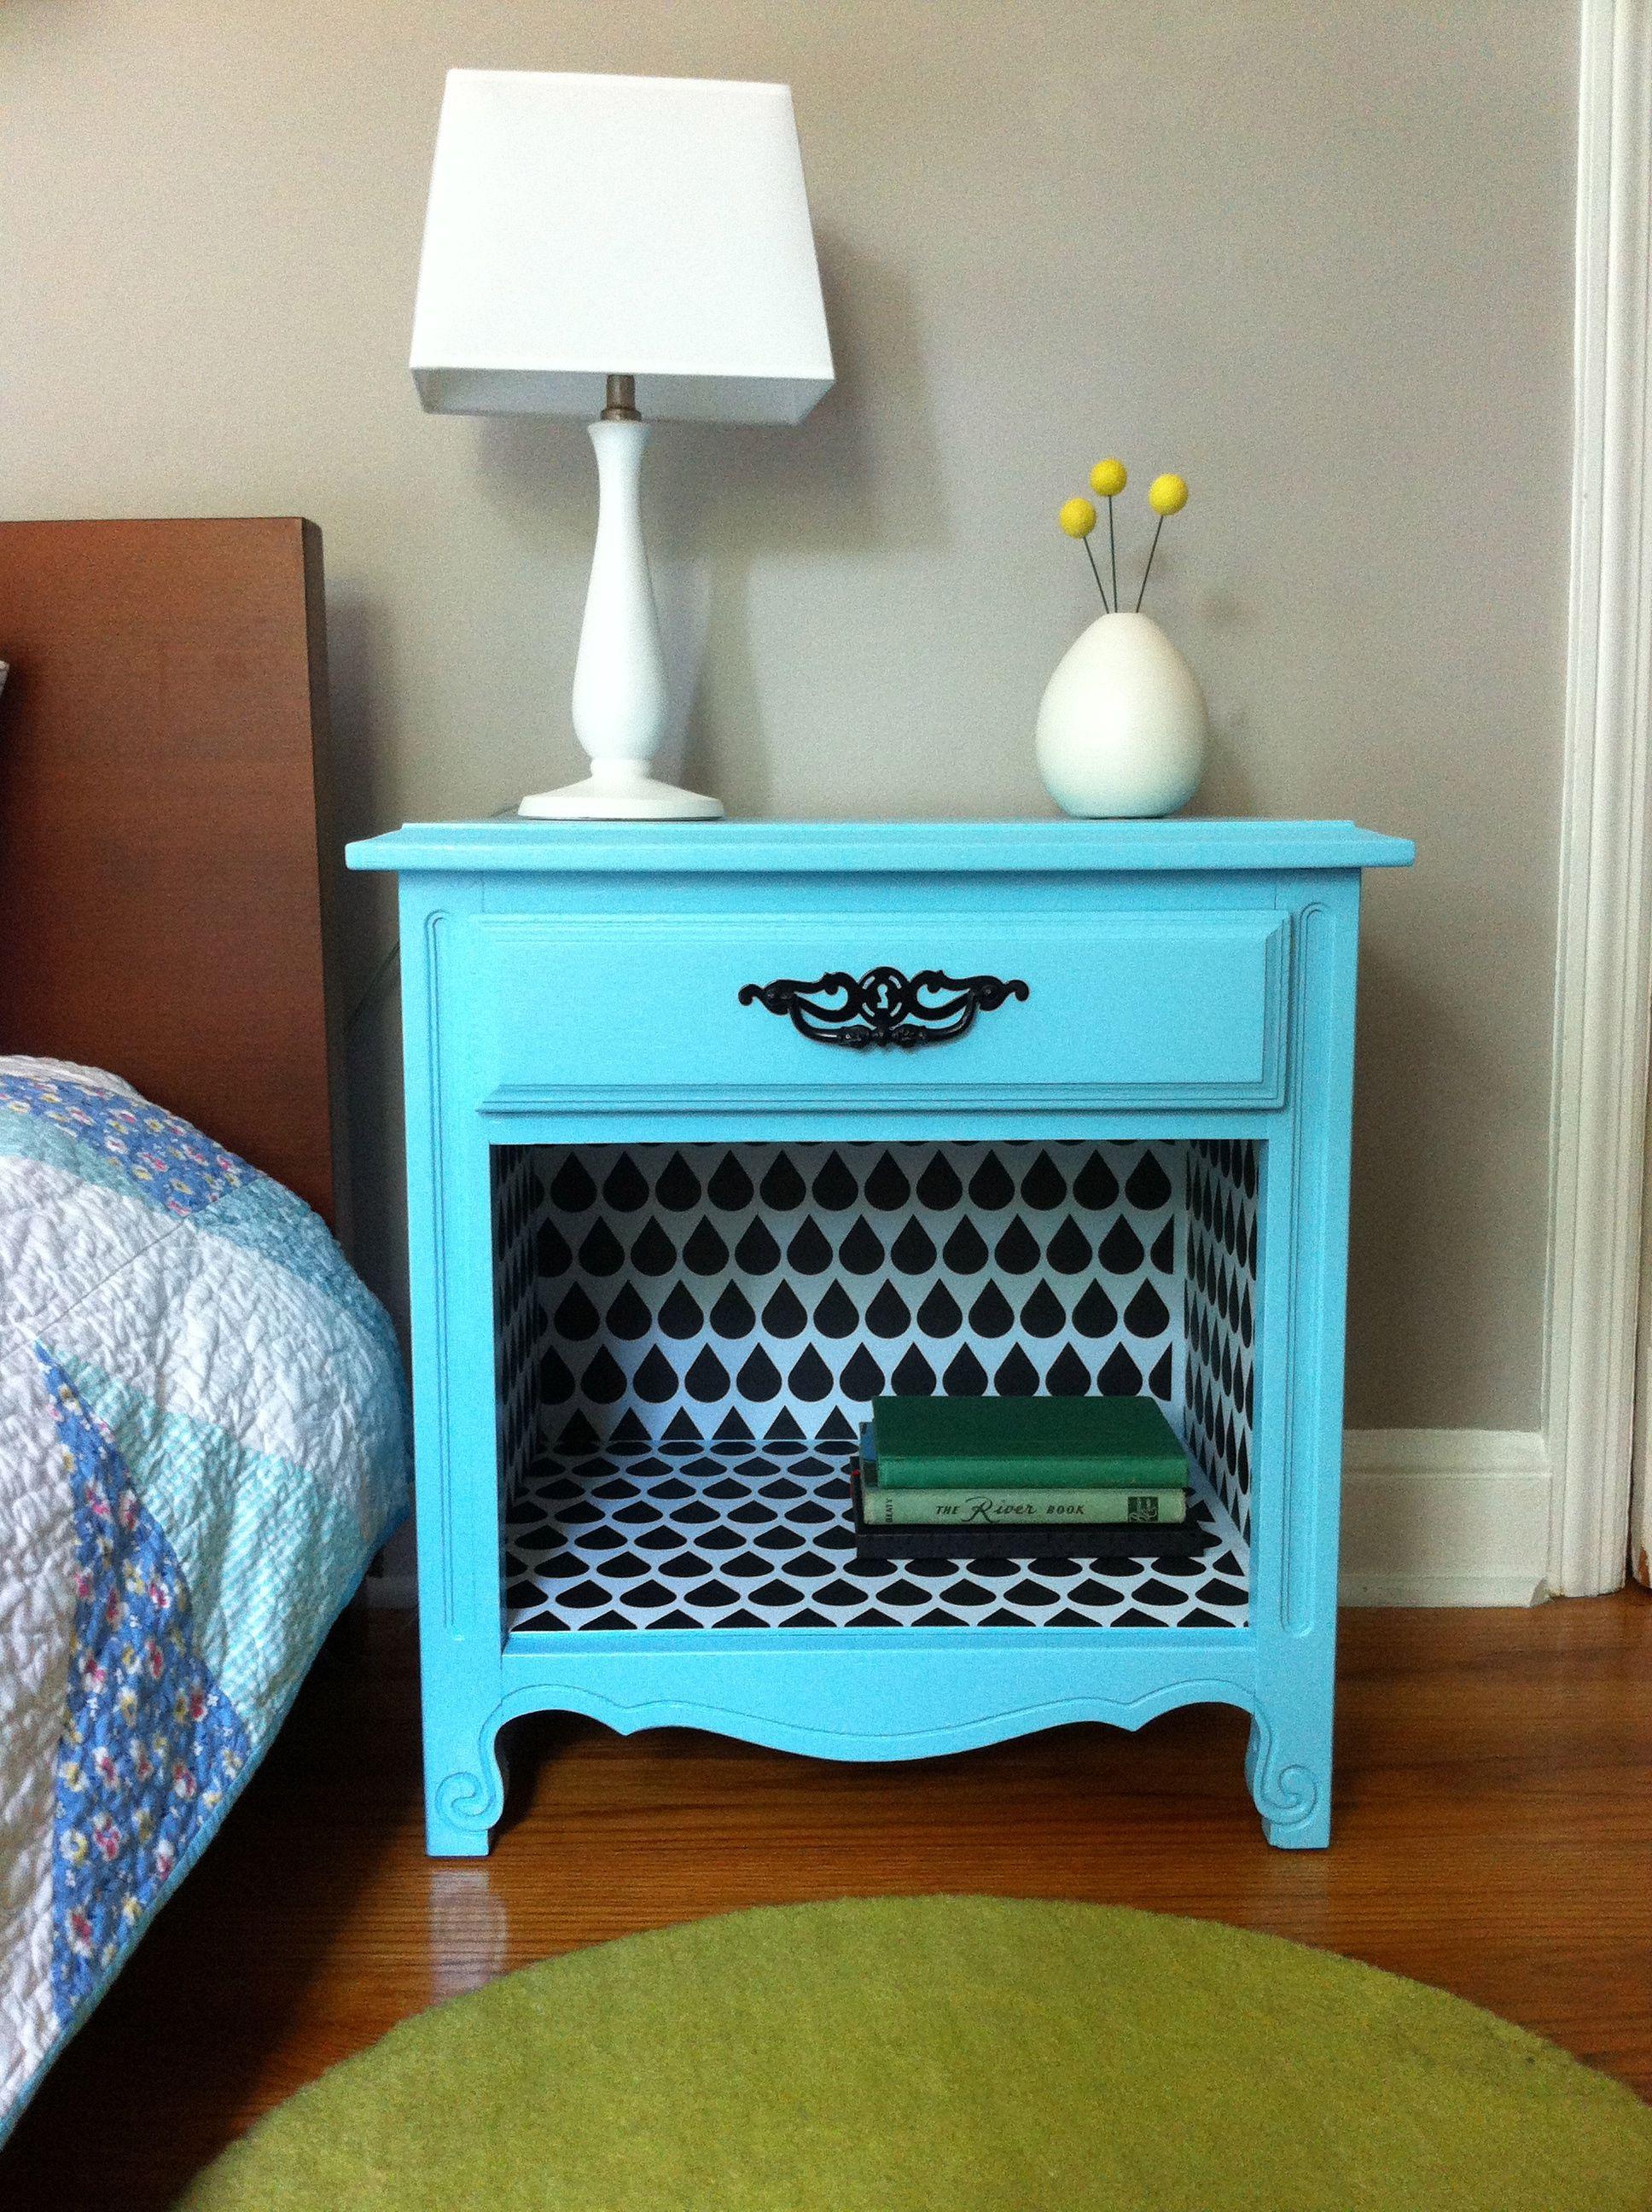 How To Improve Furniture With Peel Stick Wallpaper Tag Tibby Design Furniture Interior Design Rustic Local Furniture